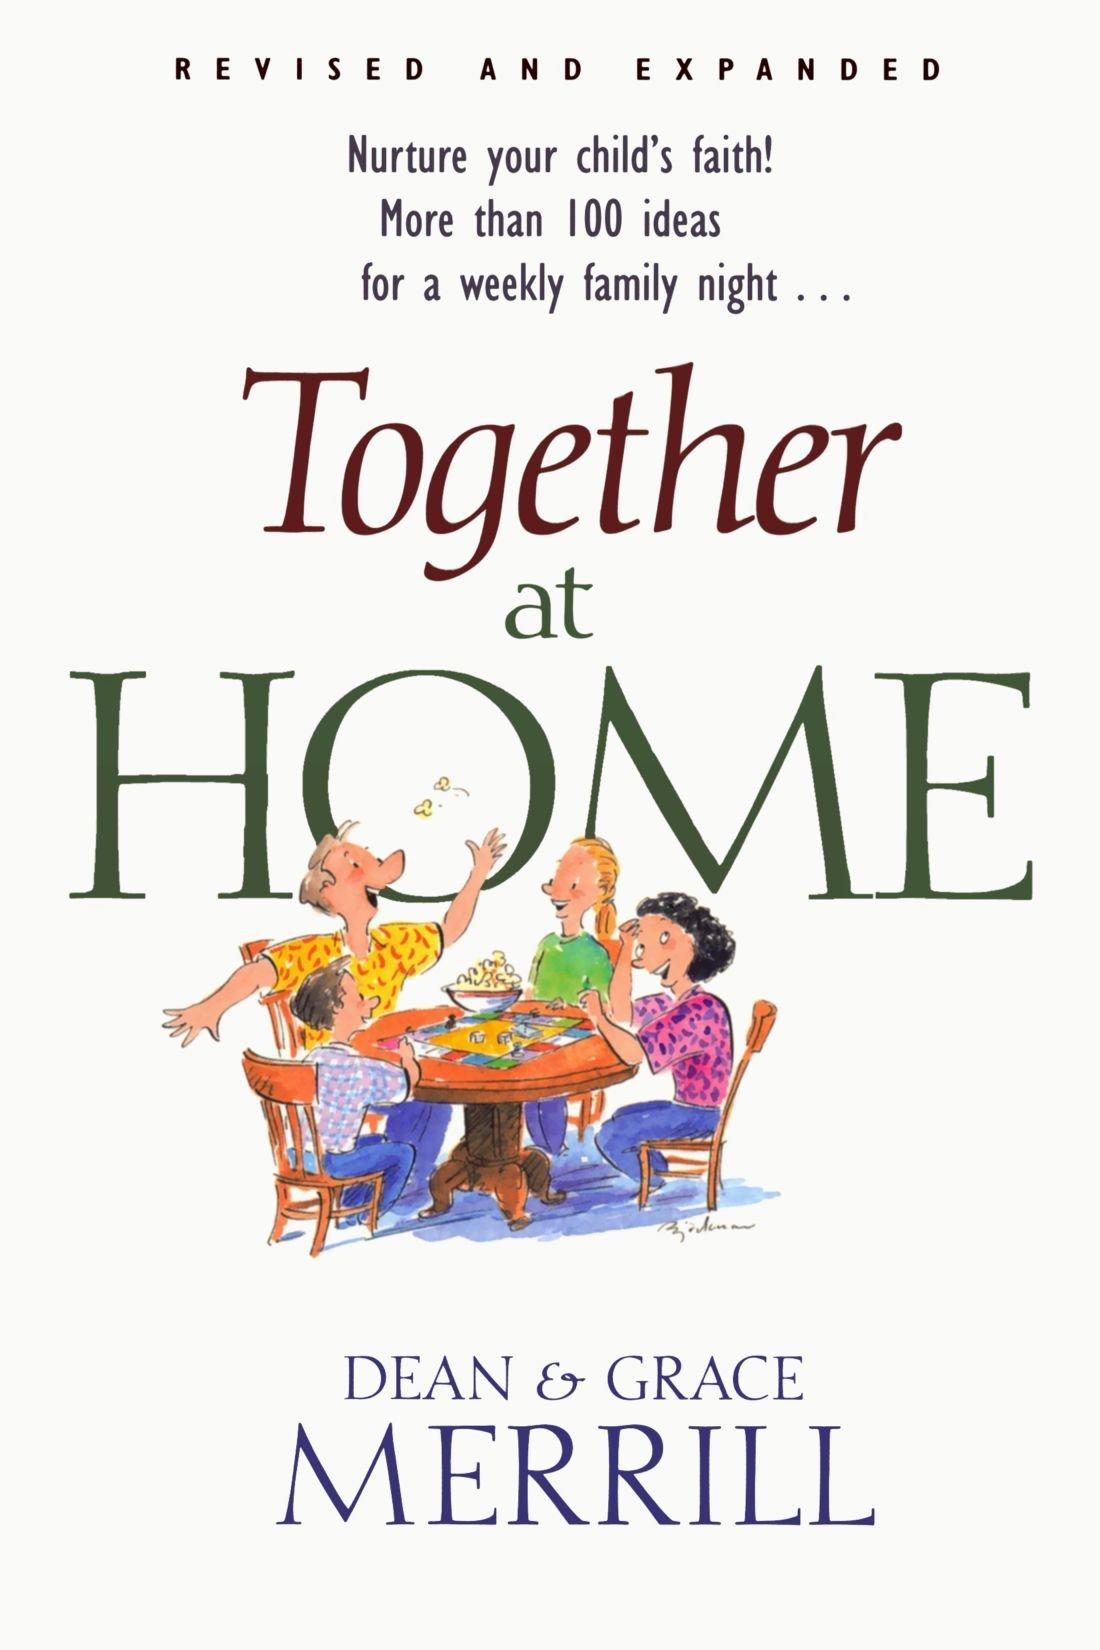 Together at Home: Mr. Dean Merrill, Grace Merrill: 9780842371759 ...